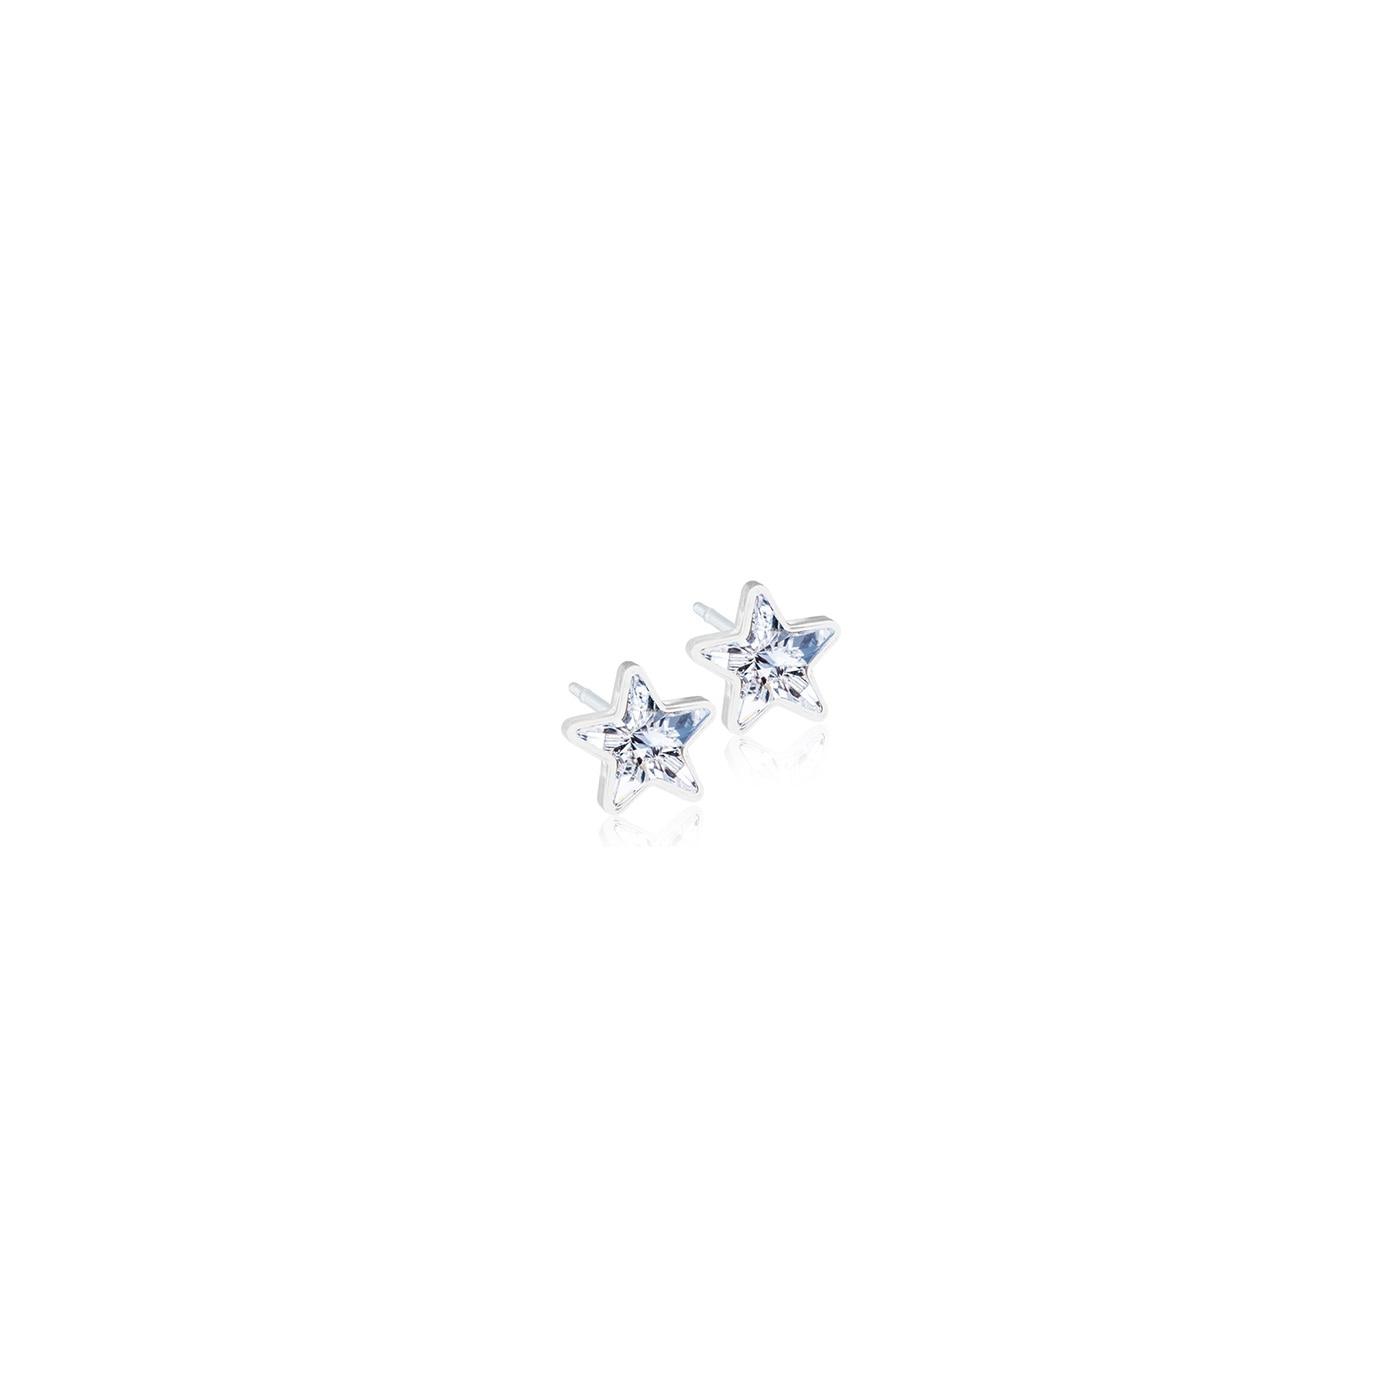 MP Star 6 mm, Crystal